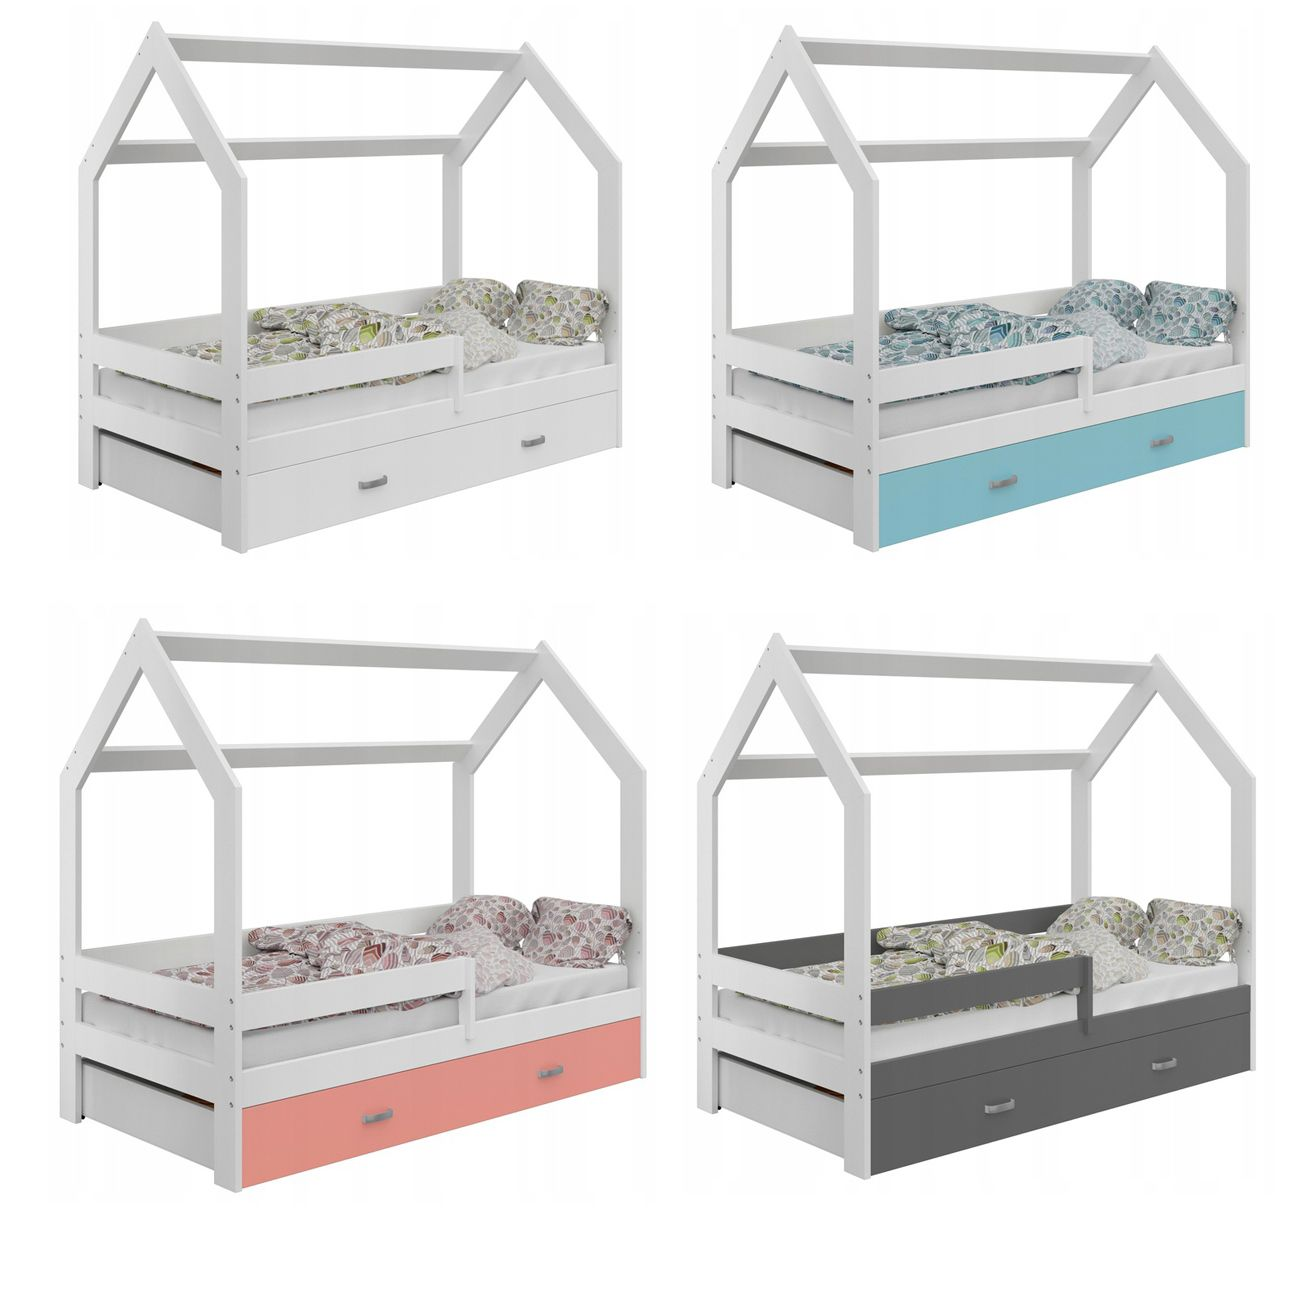 Kinderbett In Schonen Farbkombinationen Geeignete Matratzengrosse 80x160 Cm Liegeflache 160x80 Kinderbett 160x80 Bett Mit Lattenrost Bett Matratze